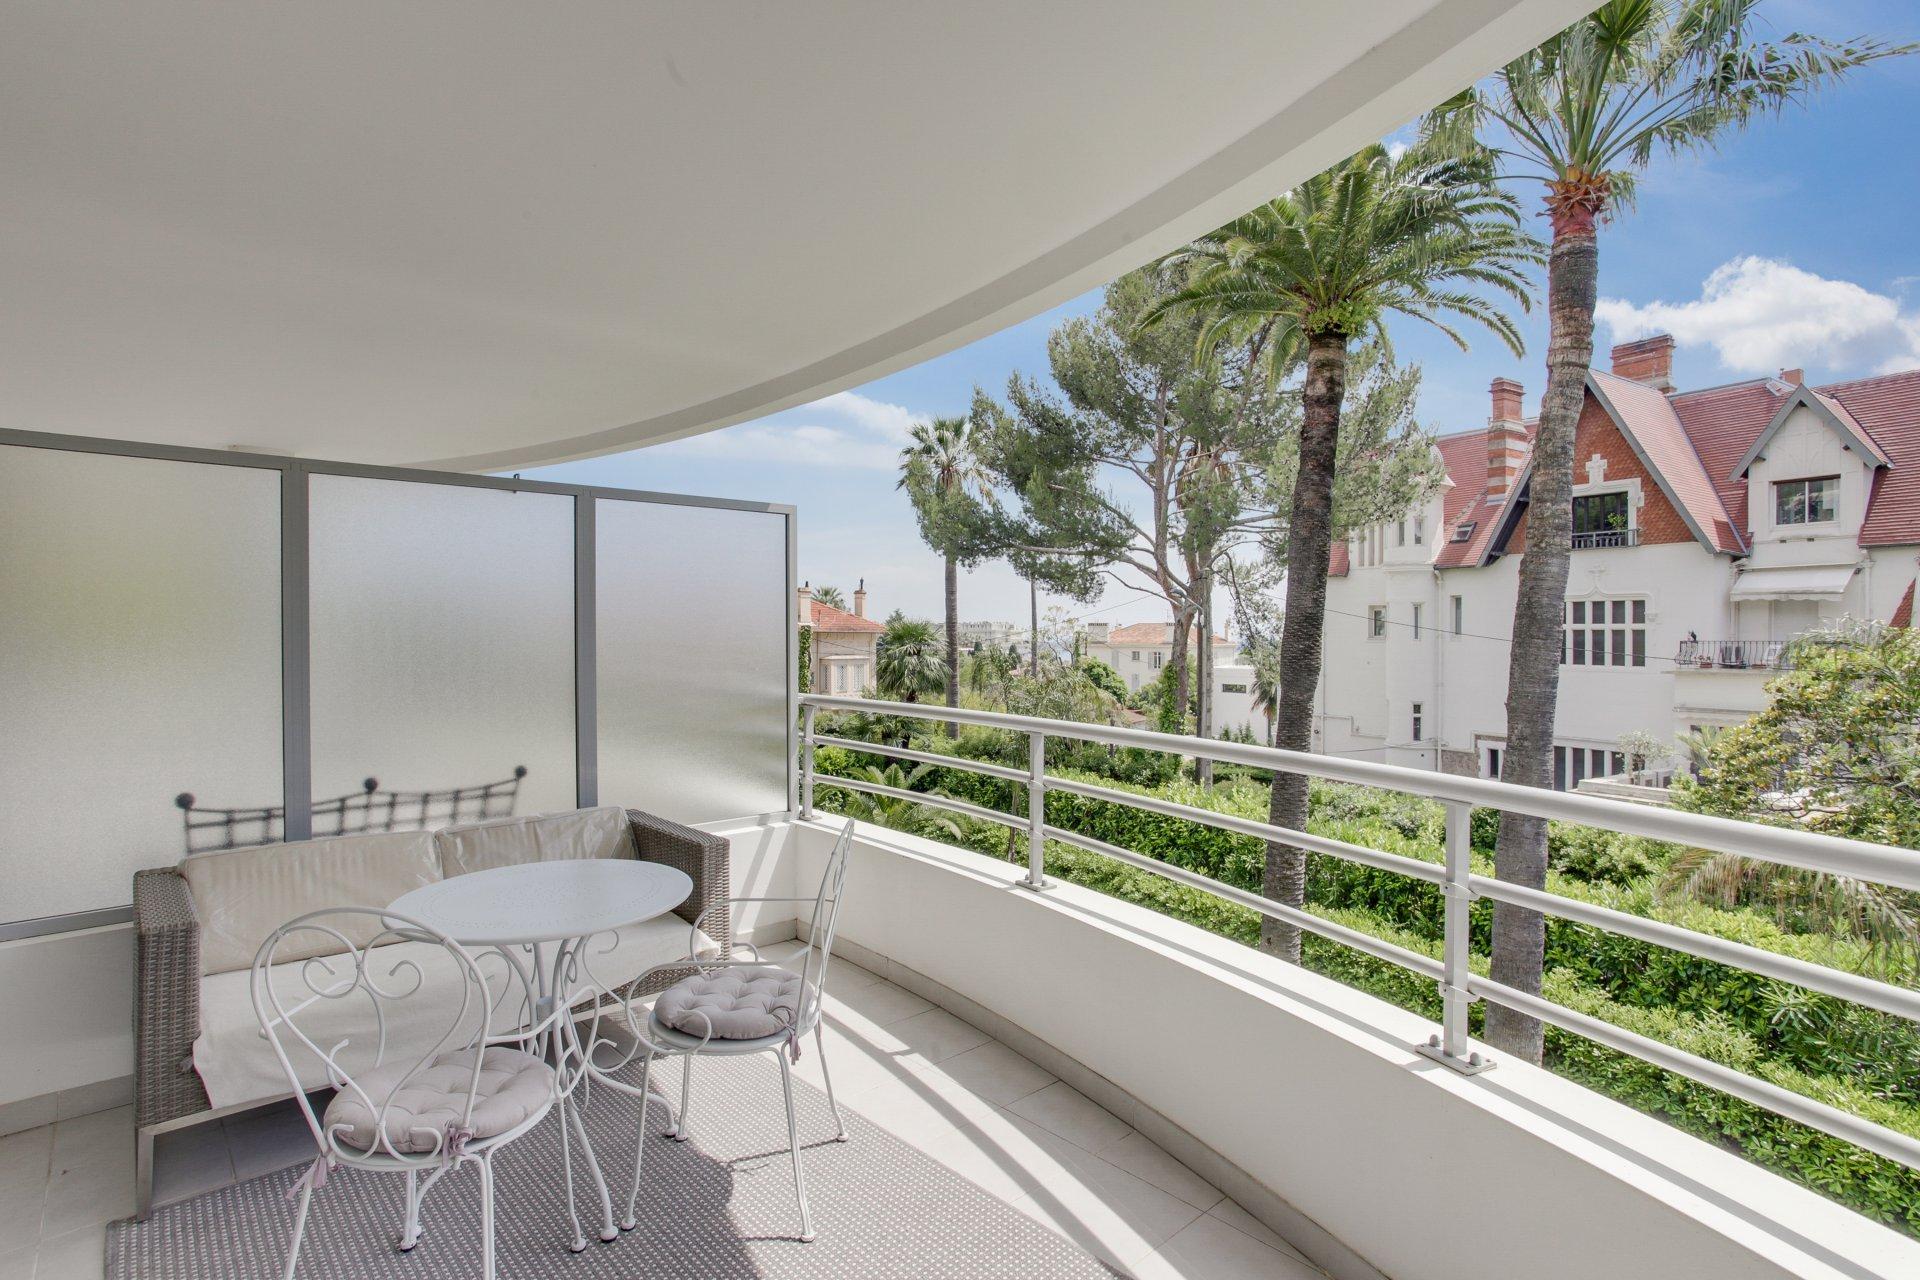 SOLD - Modern 1 bedroom apartment in wonderful Cannes Californie